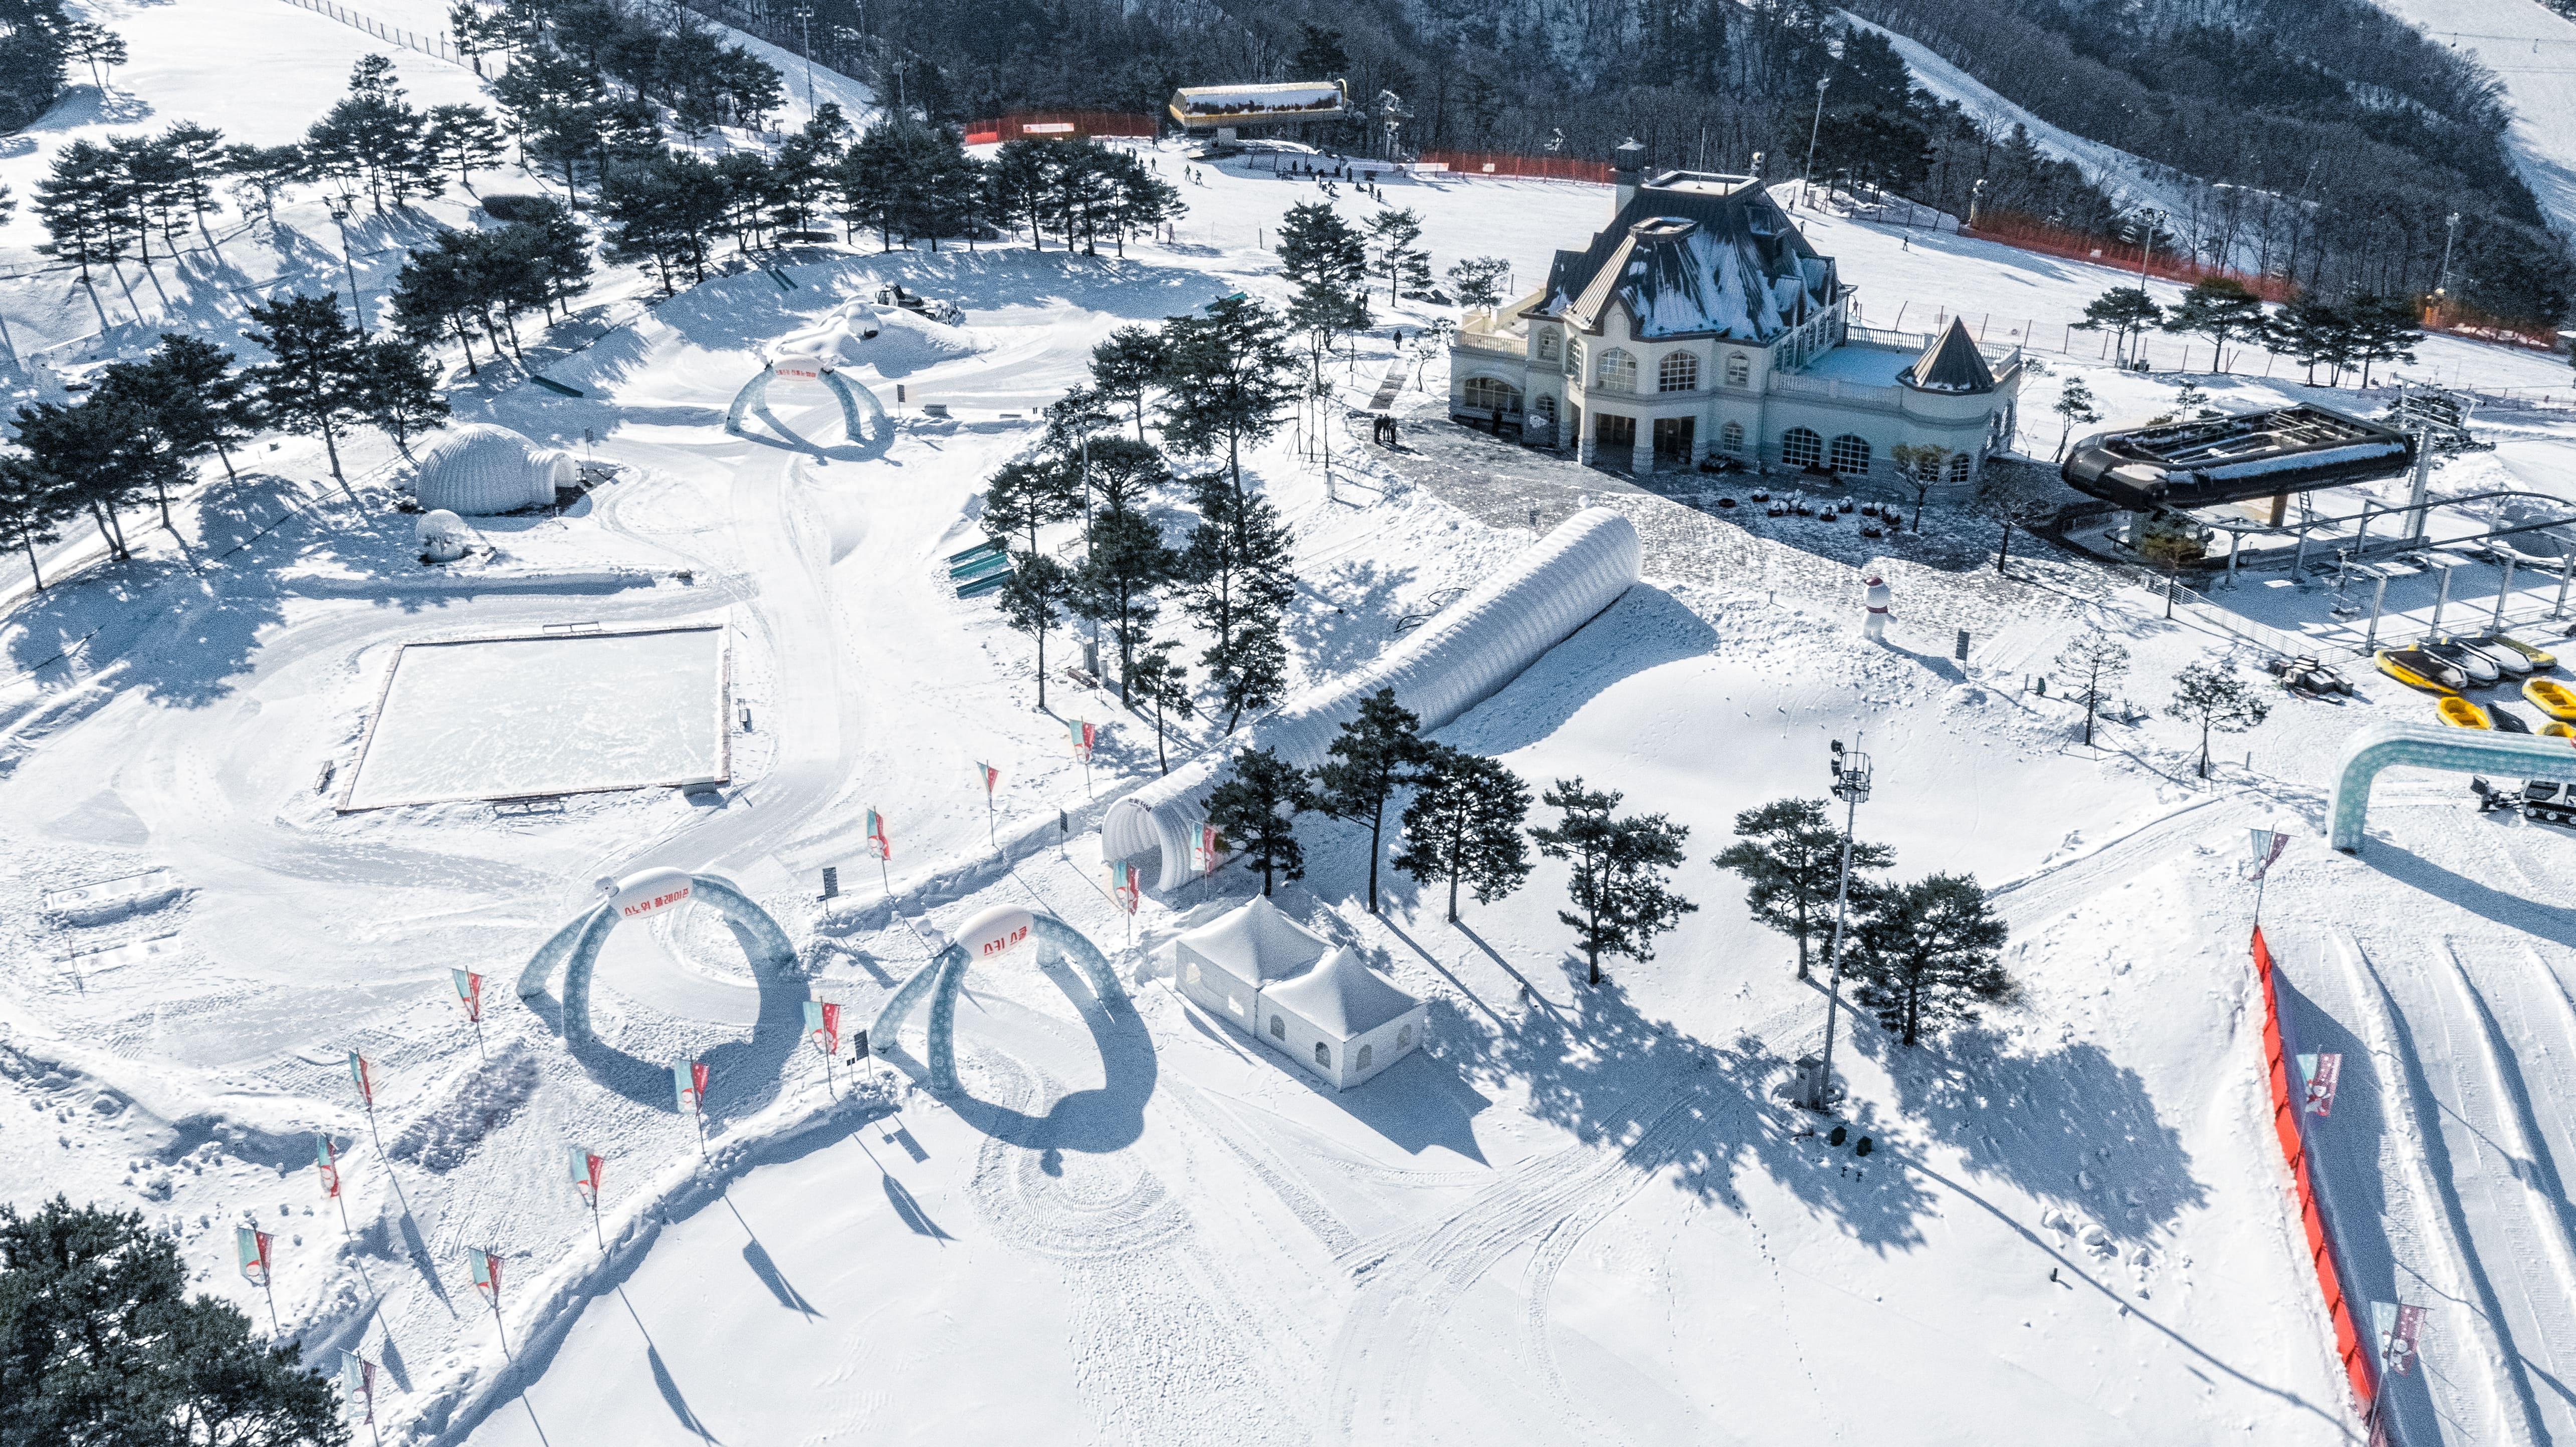 best 5 winter sports to enjoy in korea – visit korea committee